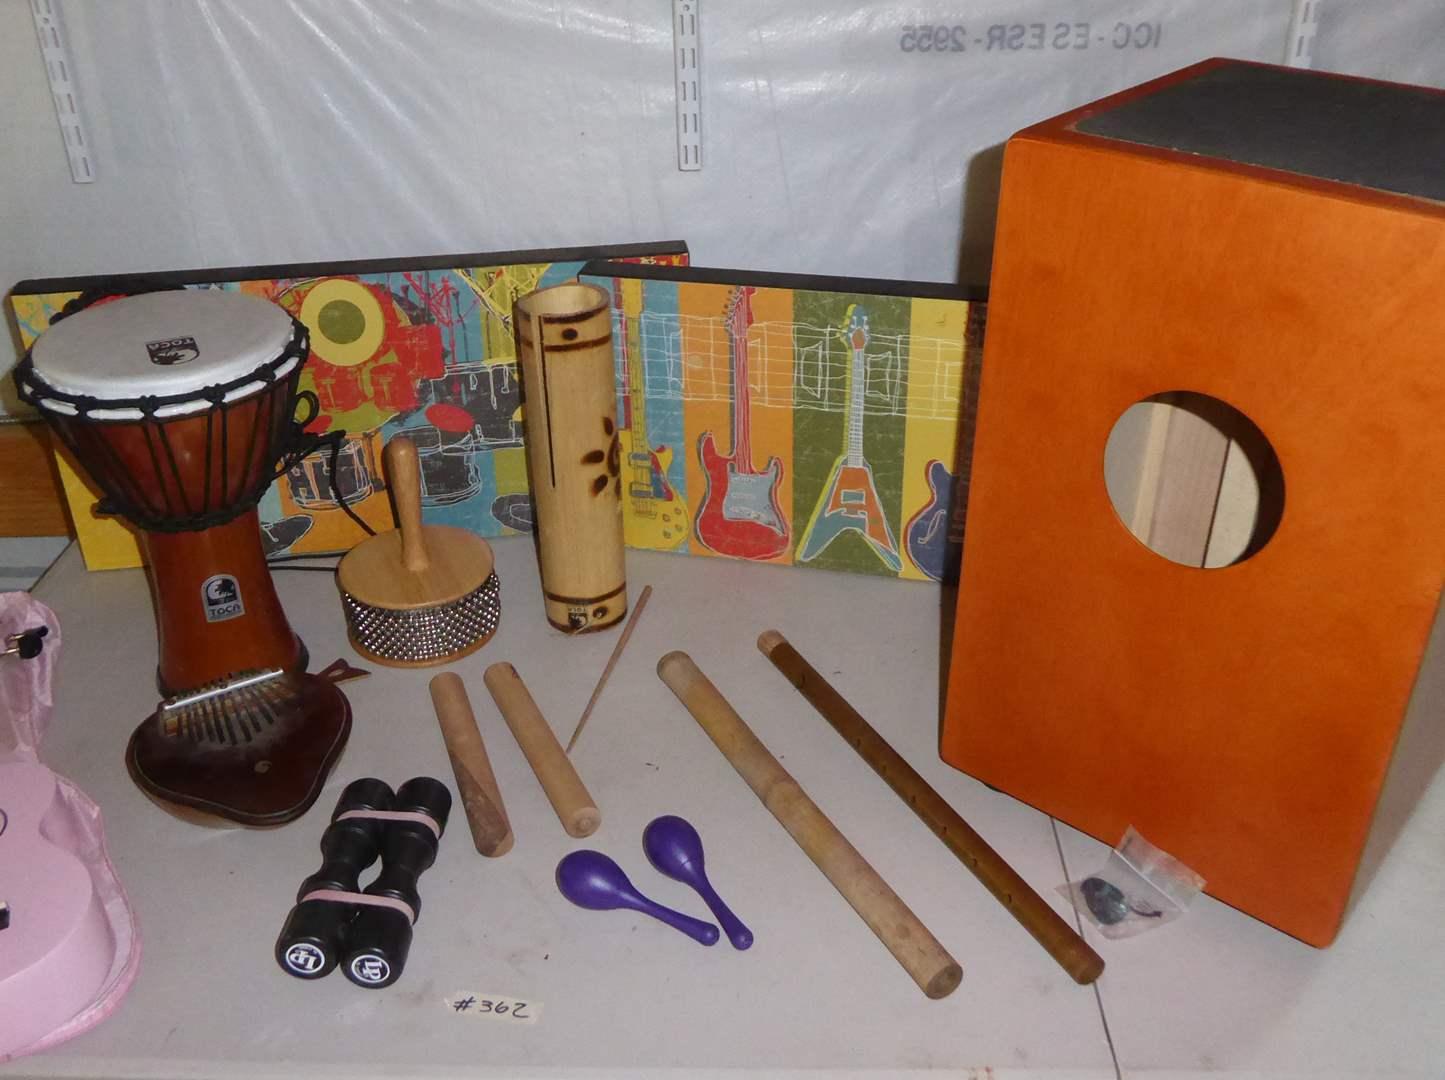 Lot # 362 - Meinl Cajon, Mahalo U30 PK Ukulele, Percussion Instruments & Flutes   (main image)